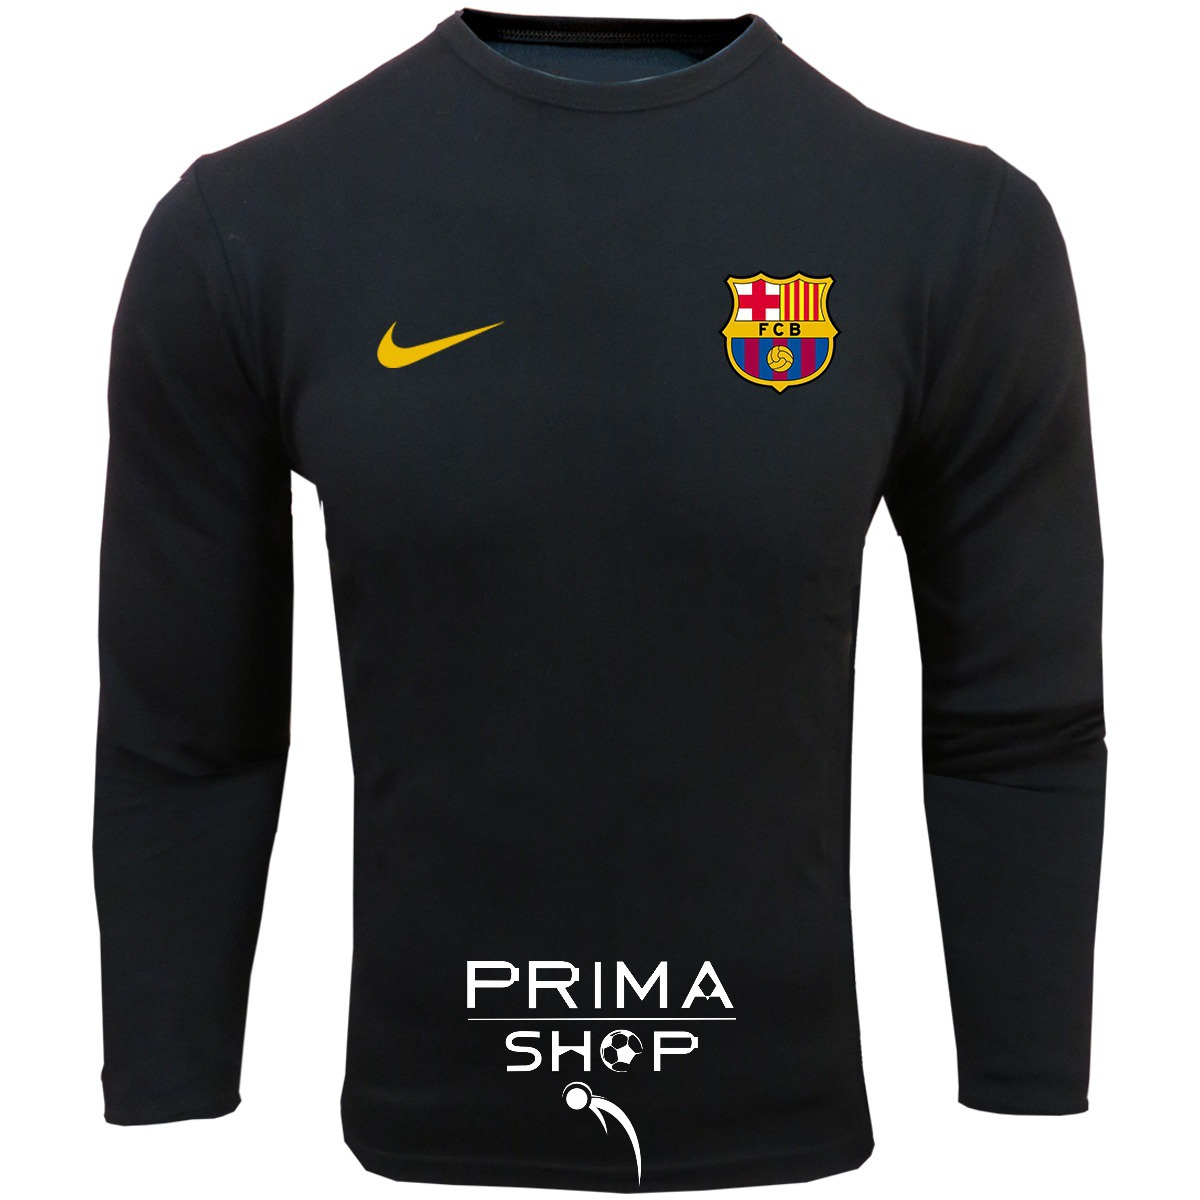 لباس هواداری بارسلونا مشکی   تیشرت آستین بلند